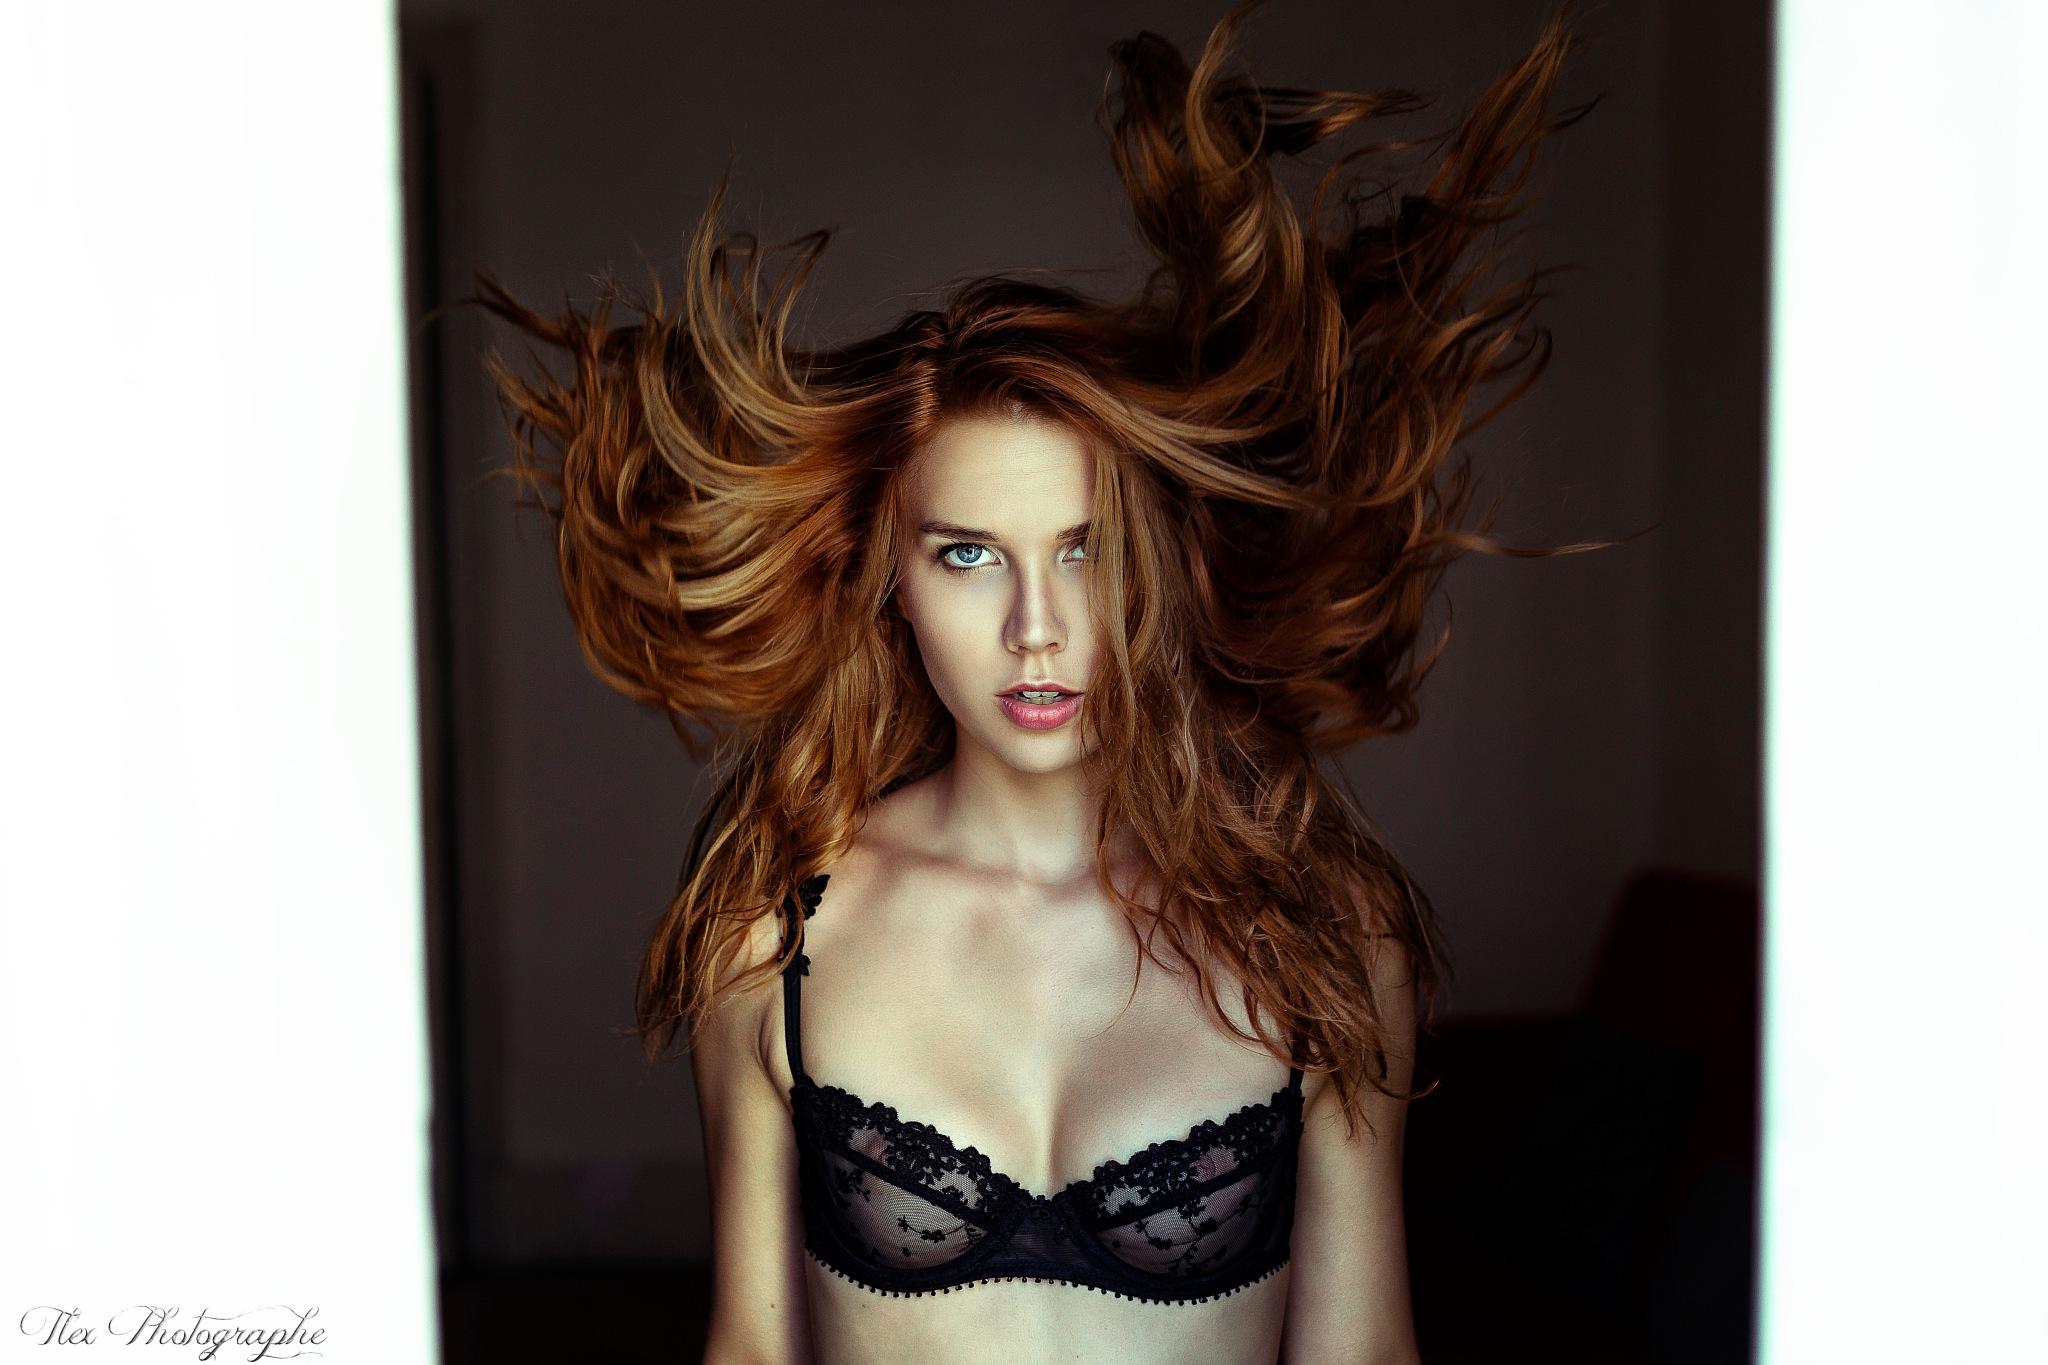 Somewhere in the Dark Hair by Tlex